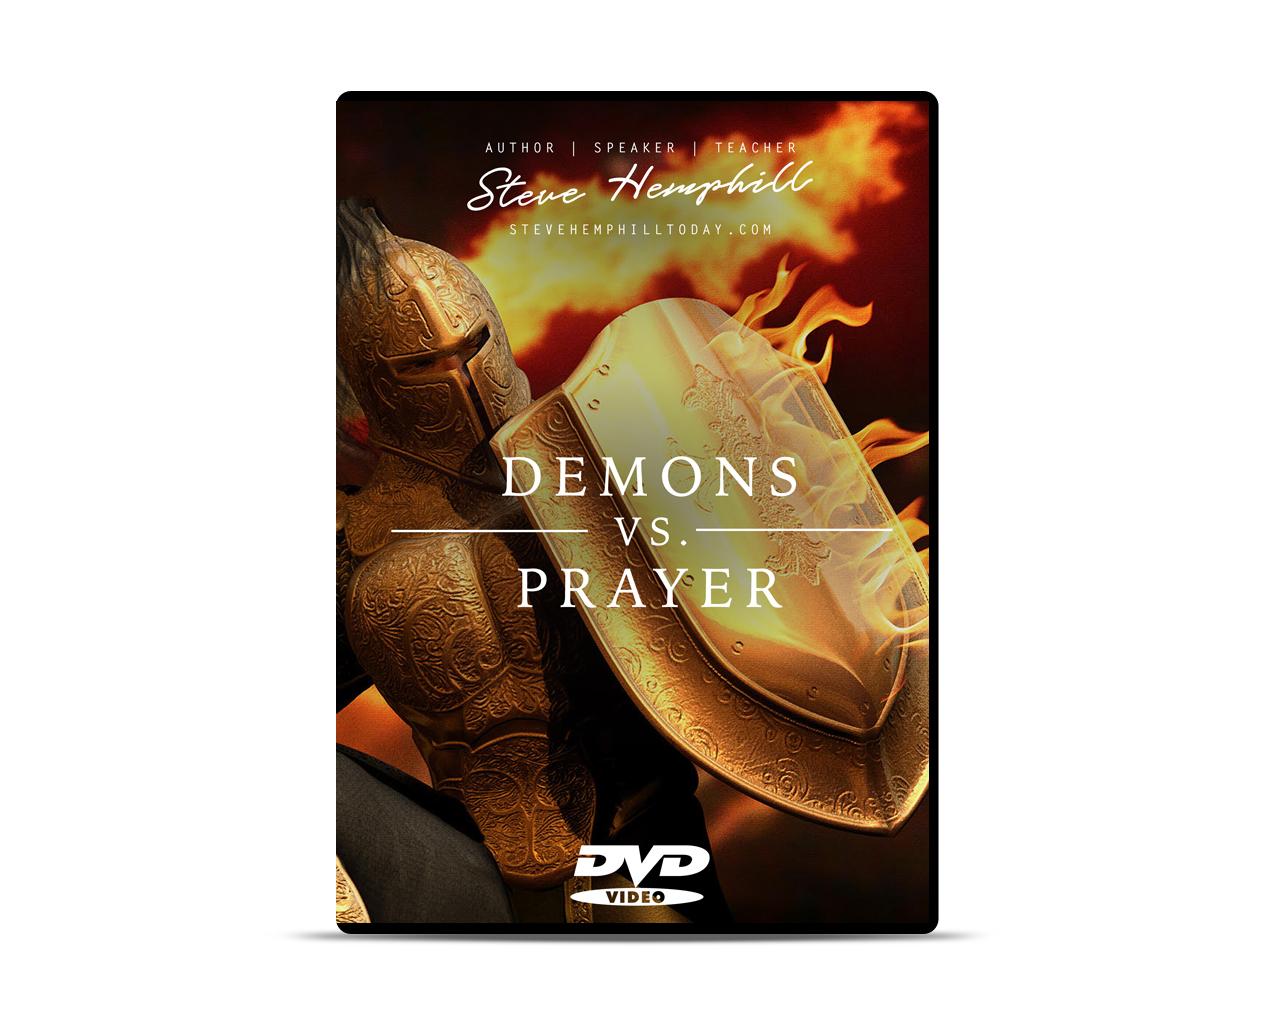 DemonsVSPRayer_DVDSet_PreOrder.jpg